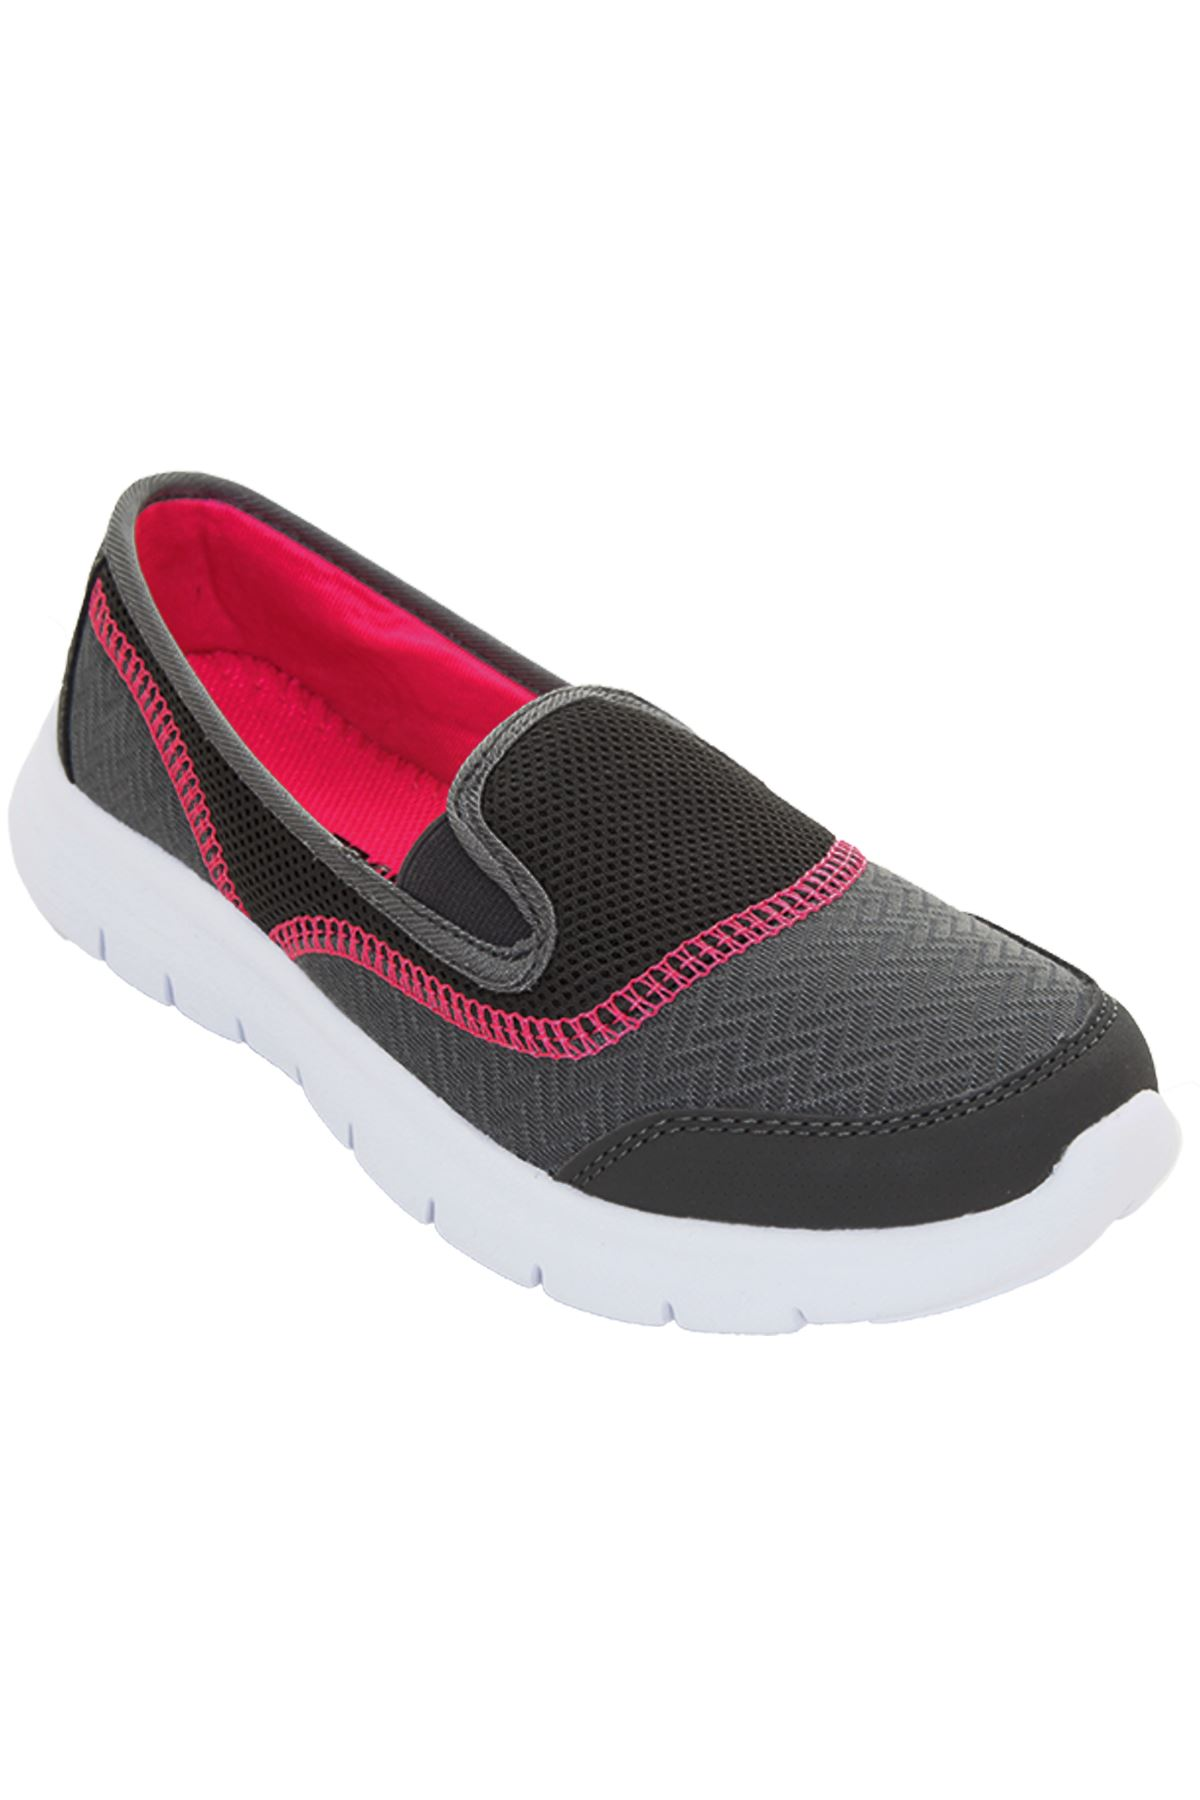 pour femmes l ger chaussures enfiler confortable plat salle de sport marche ebay. Black Bedroom Furniture Sets. Home Design Ideas